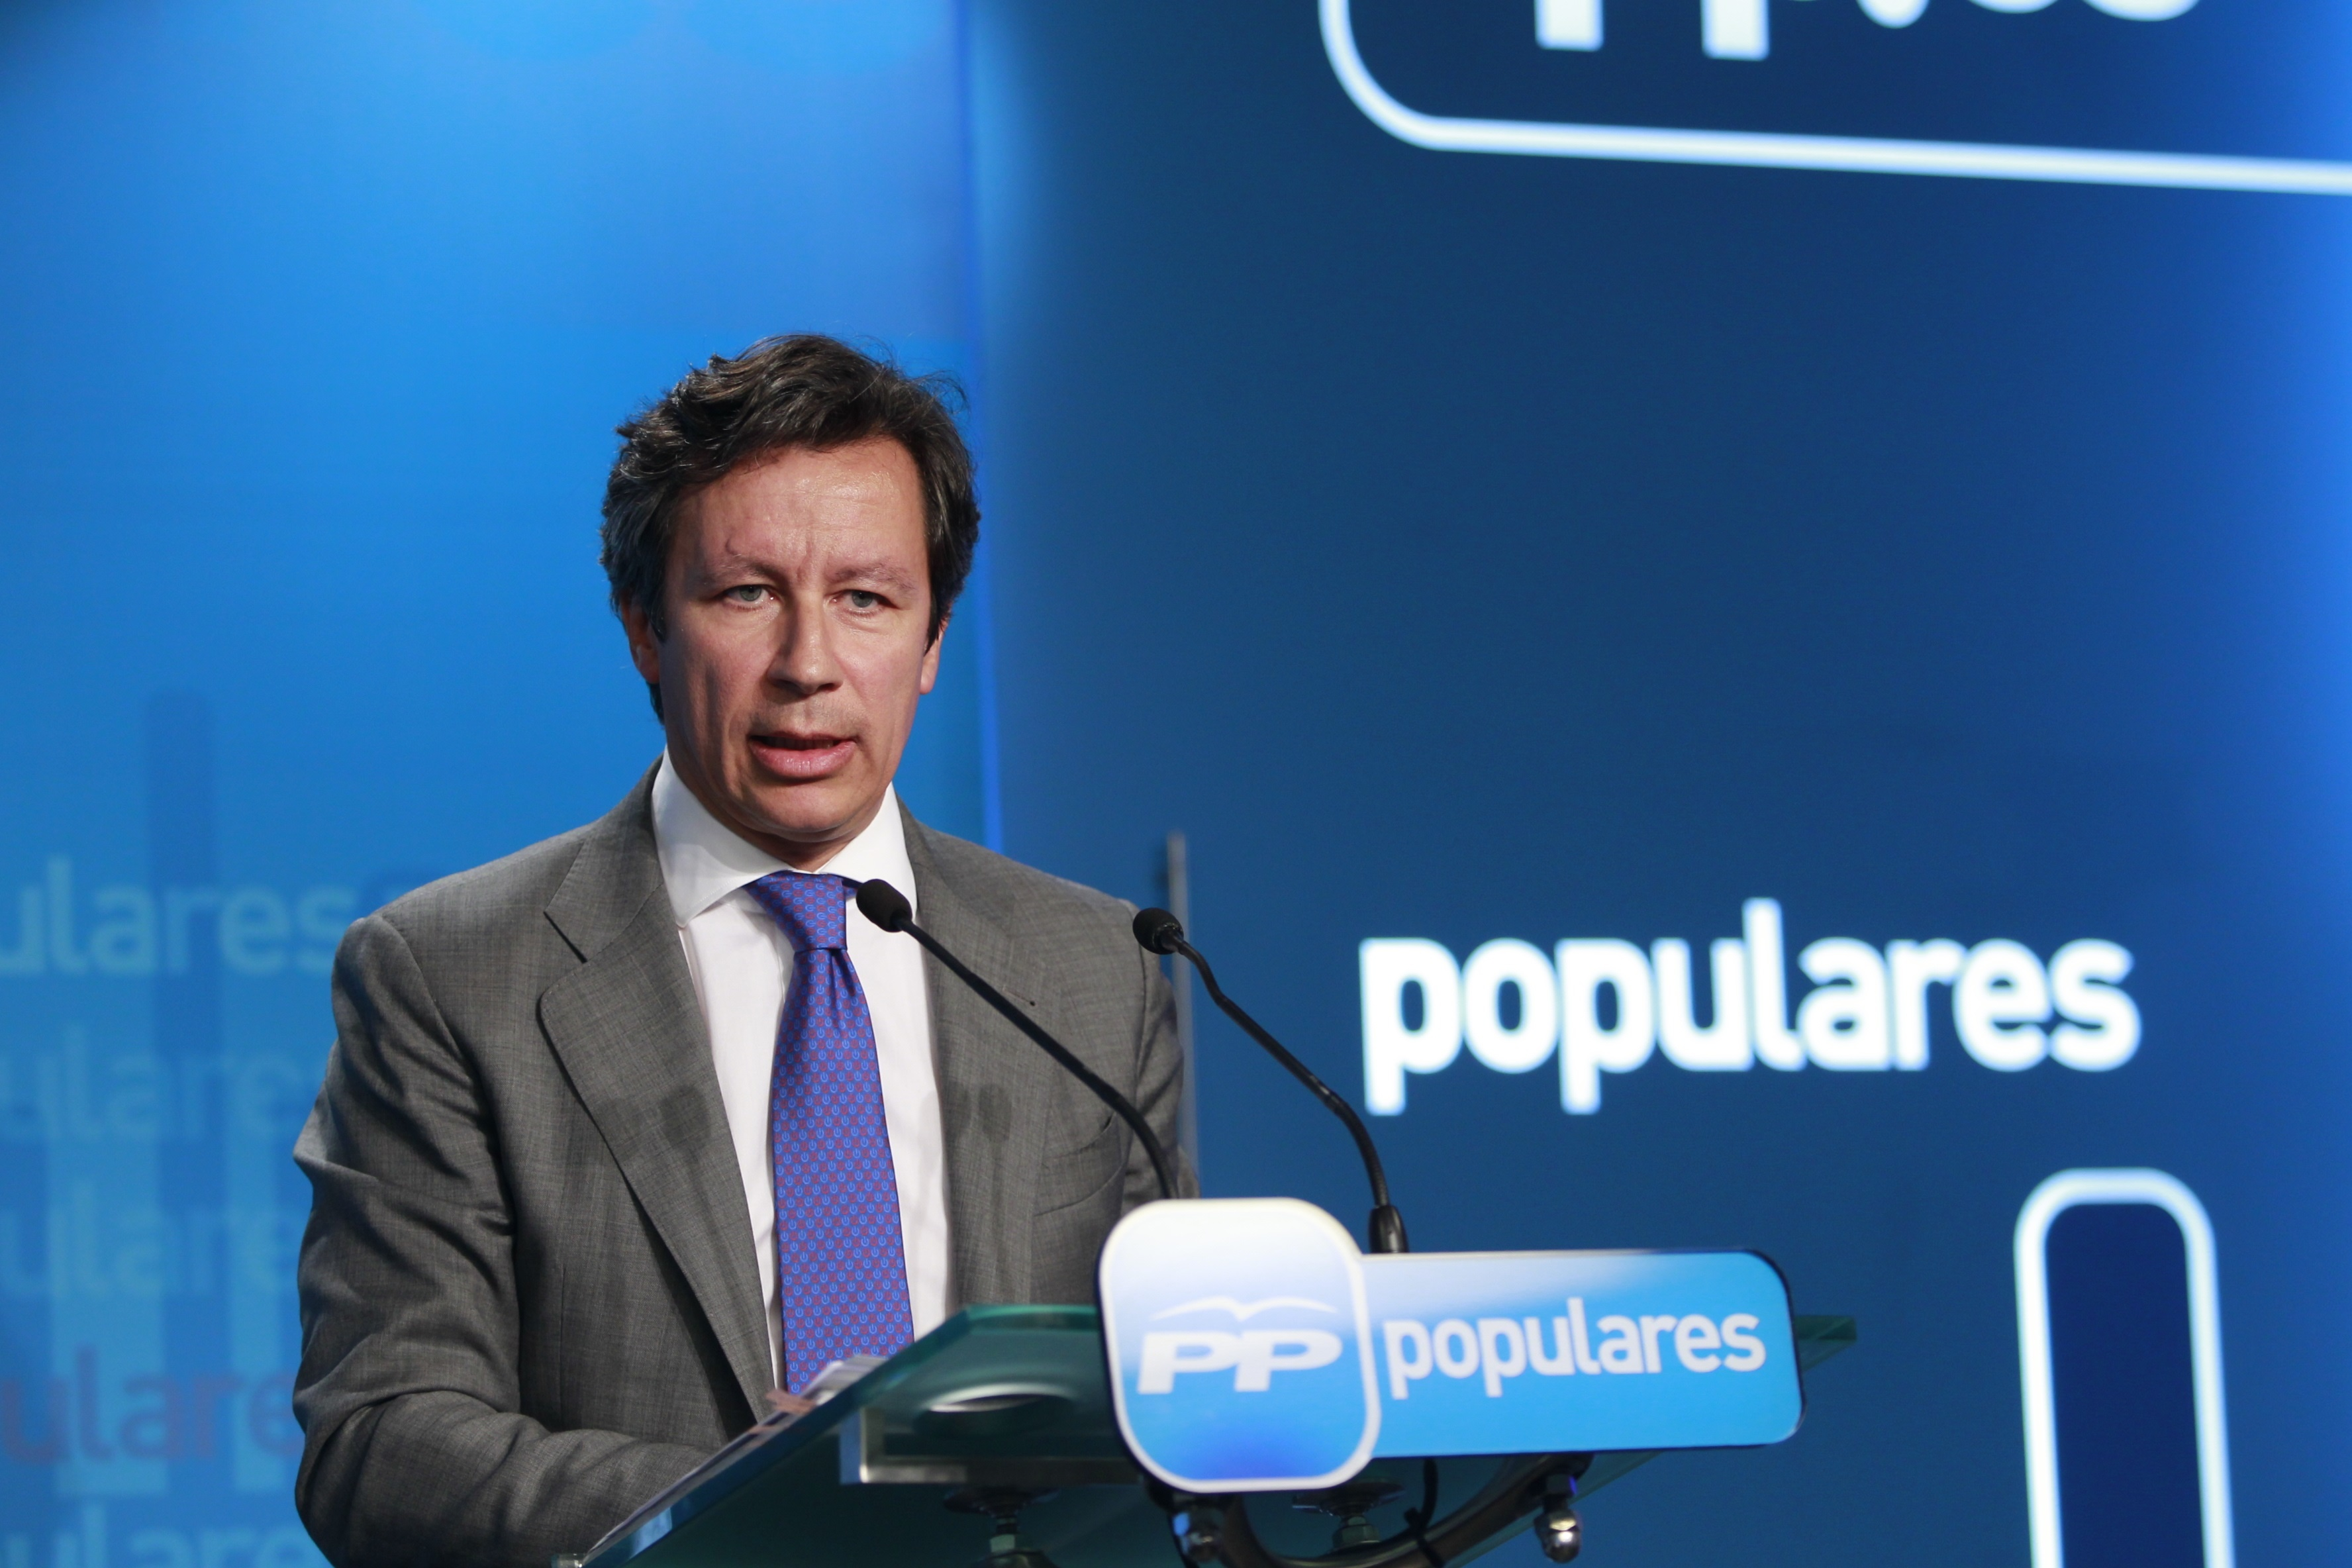 Floriano (PP) califica de «broma» que Rajoy tenga que comparecer cada vez que habla un testigo